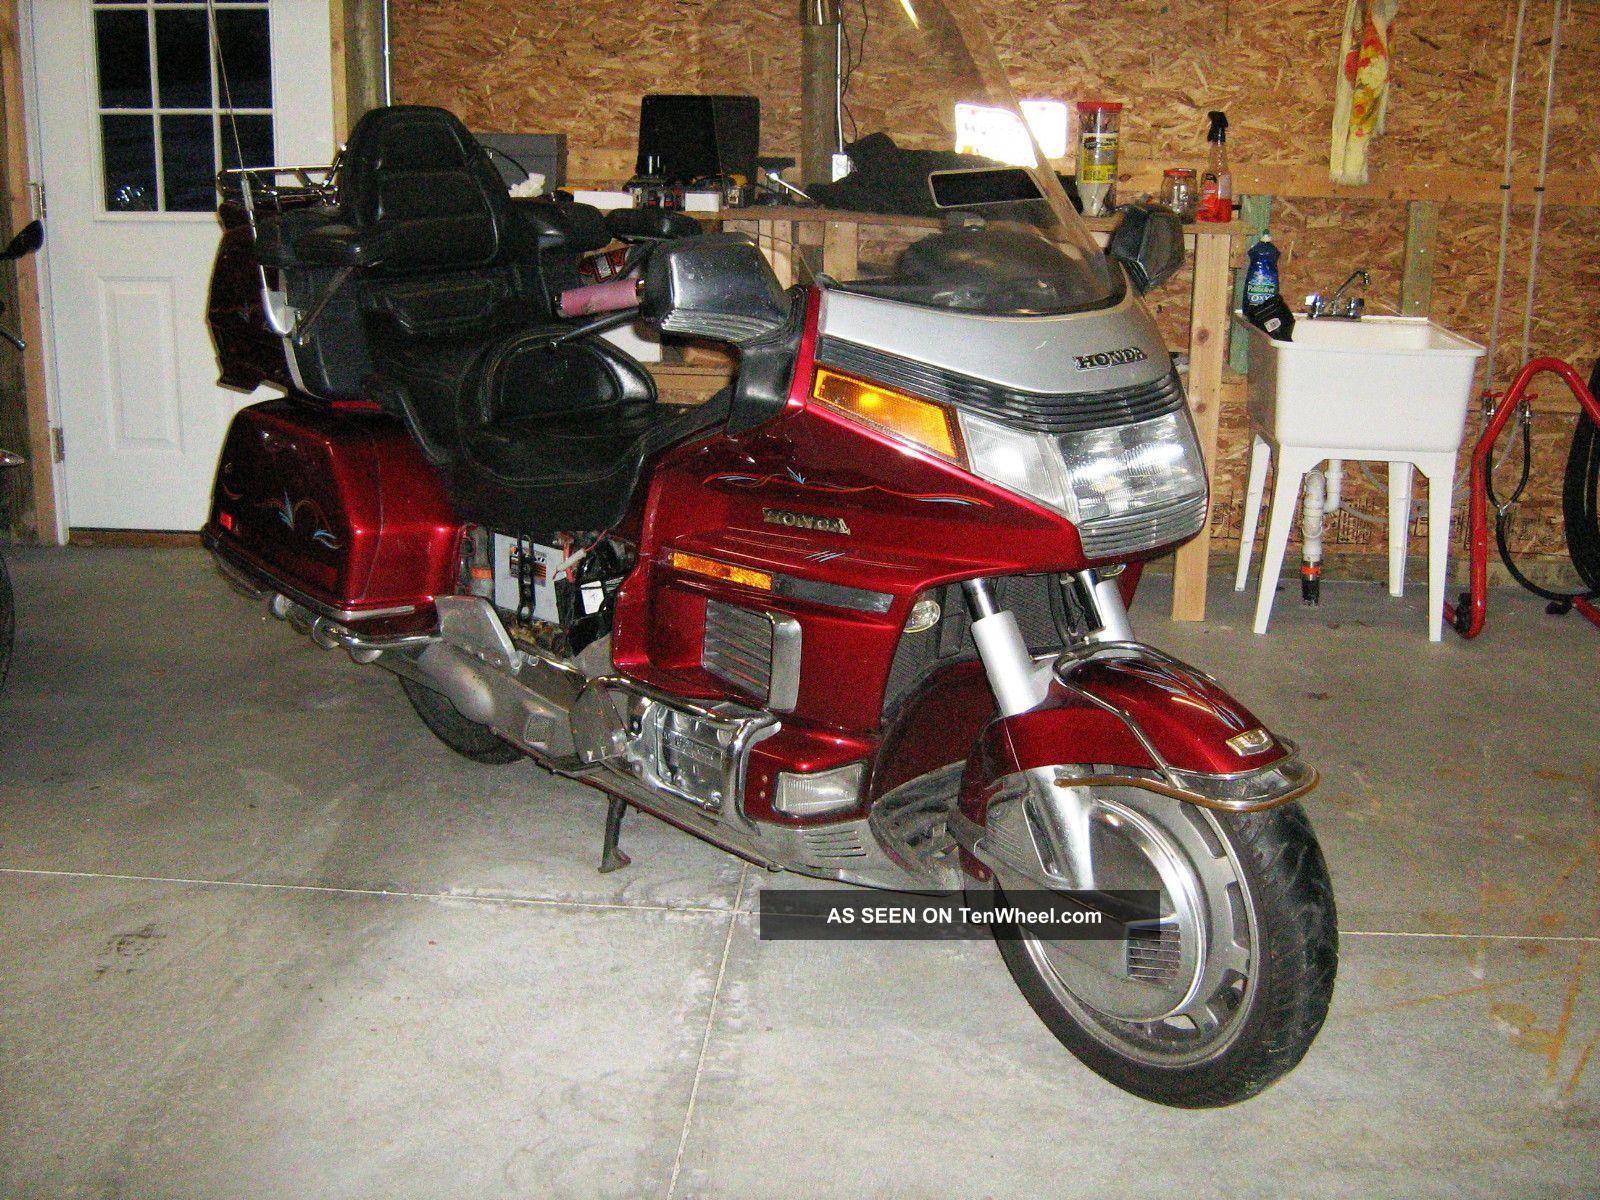 1992 Honda Gl1500i Gl1500 Goldwing Gold Wing Gl 1500 Gold Wing photo